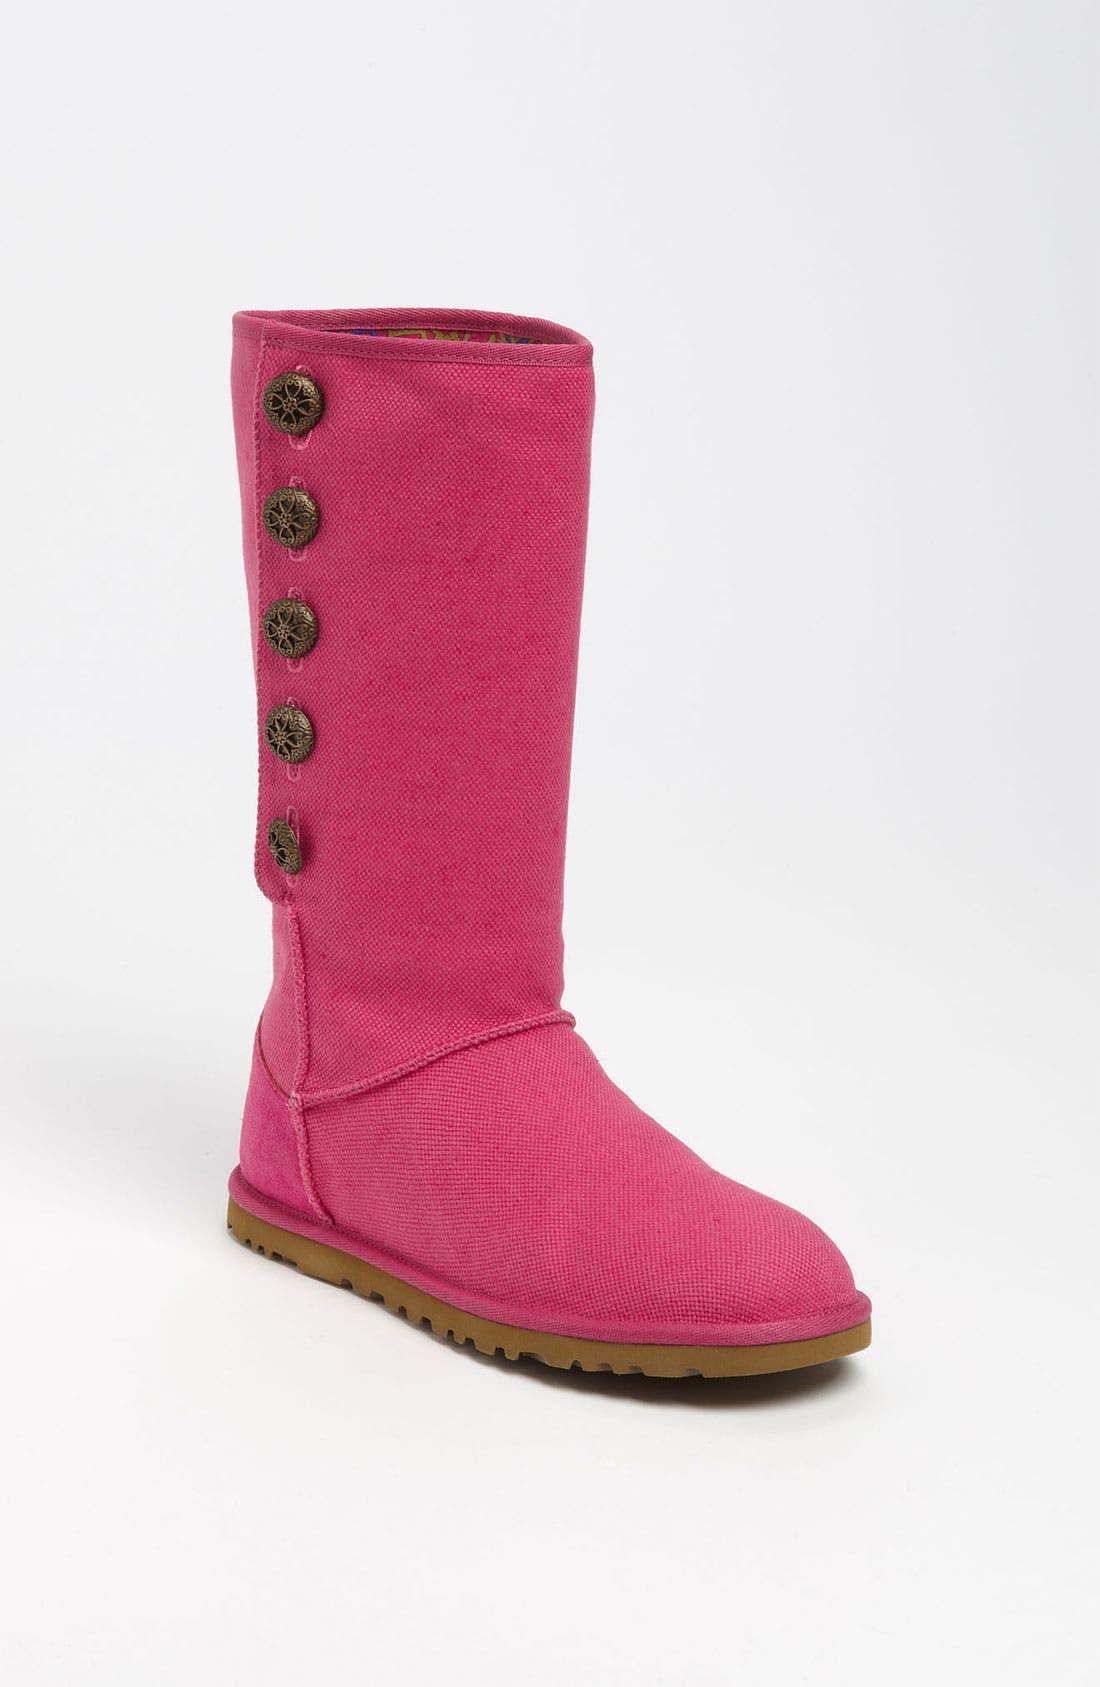 Main Image - UGG® Australia 'Lo Pro Marrakesh' Boot (Women)